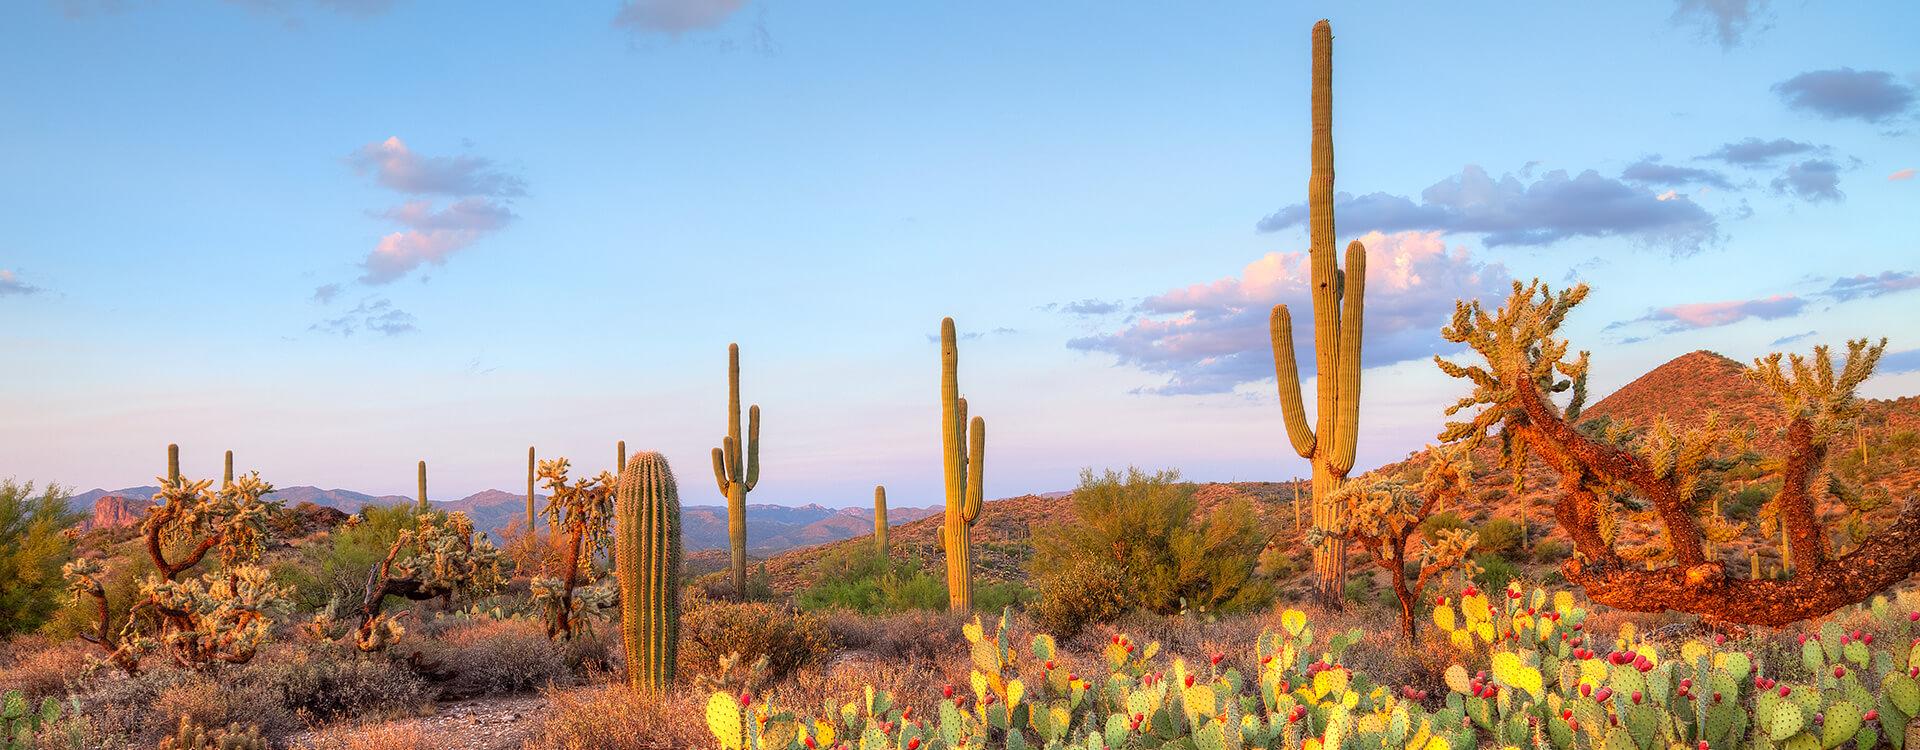 Local Area Activities of Scottsdale